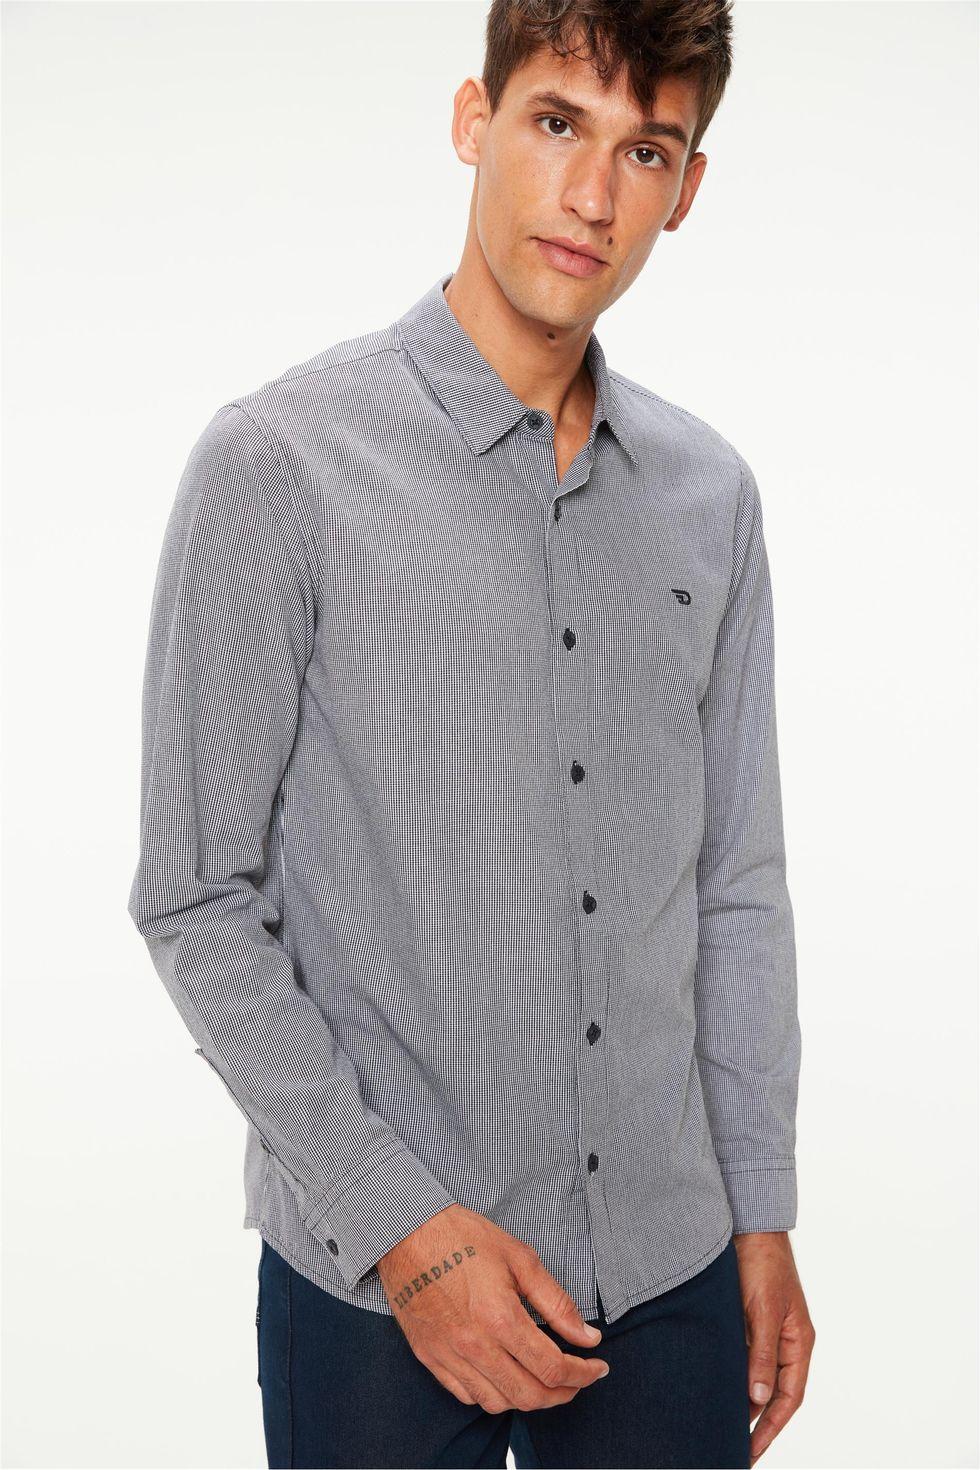 Camisa-Manga-Longa-com-Estampa-Xadrez-Frente--